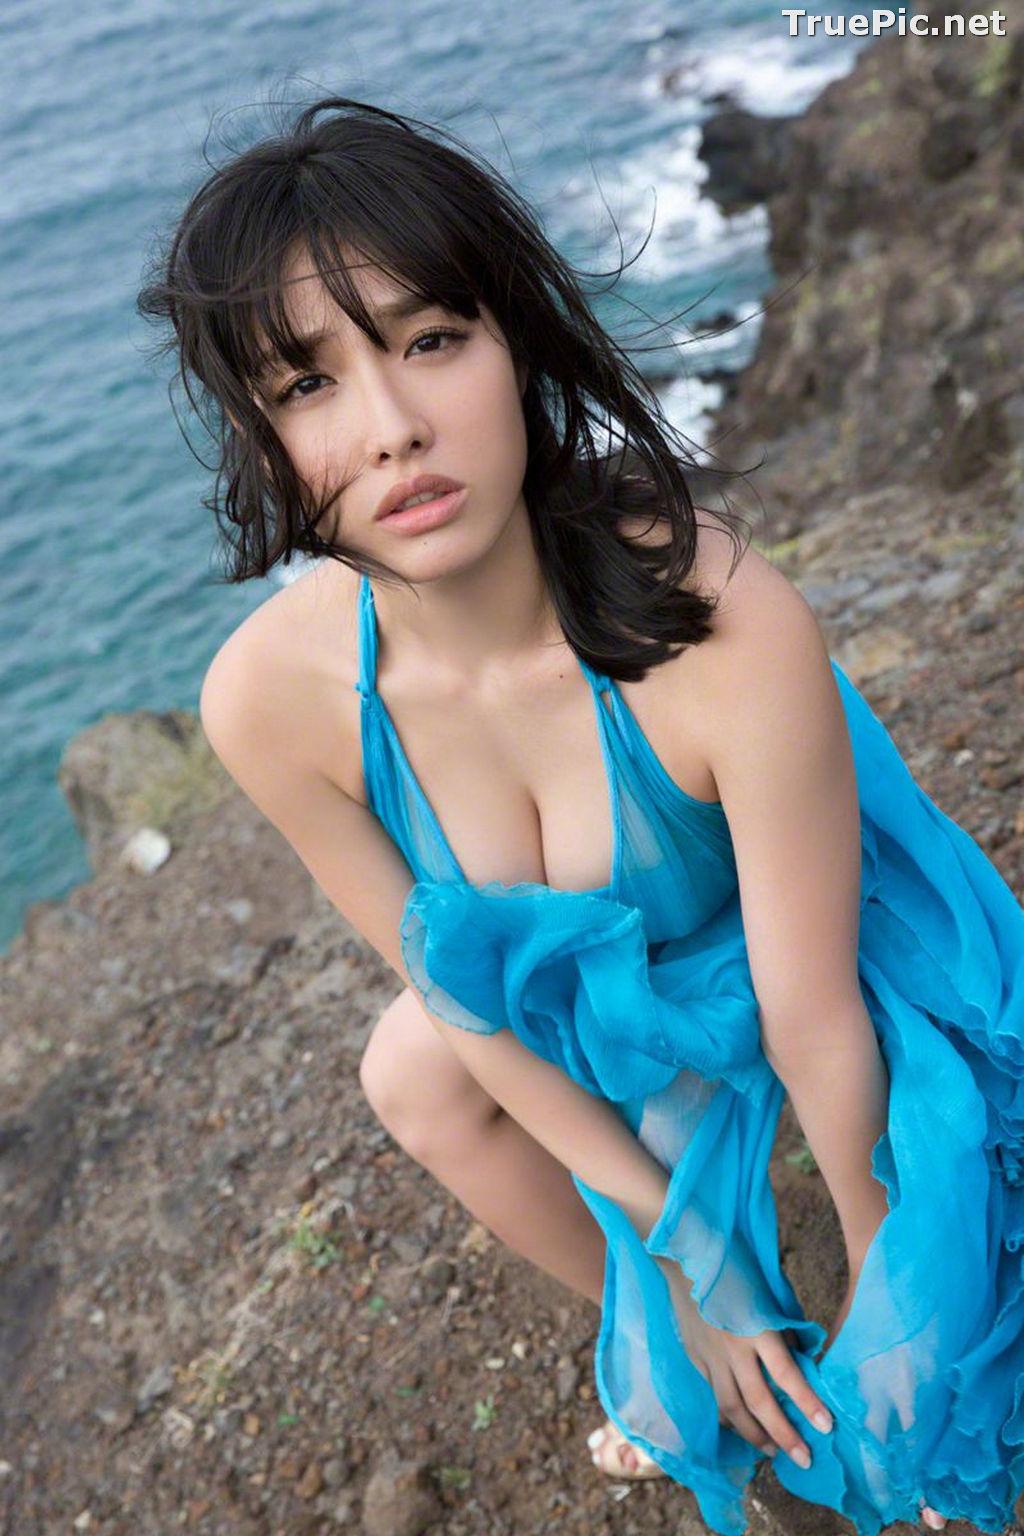 Image Wanibooks No.127 - Japanese Gravure Idol and Actress - Anna Konno - TruePic.net - Picture-9